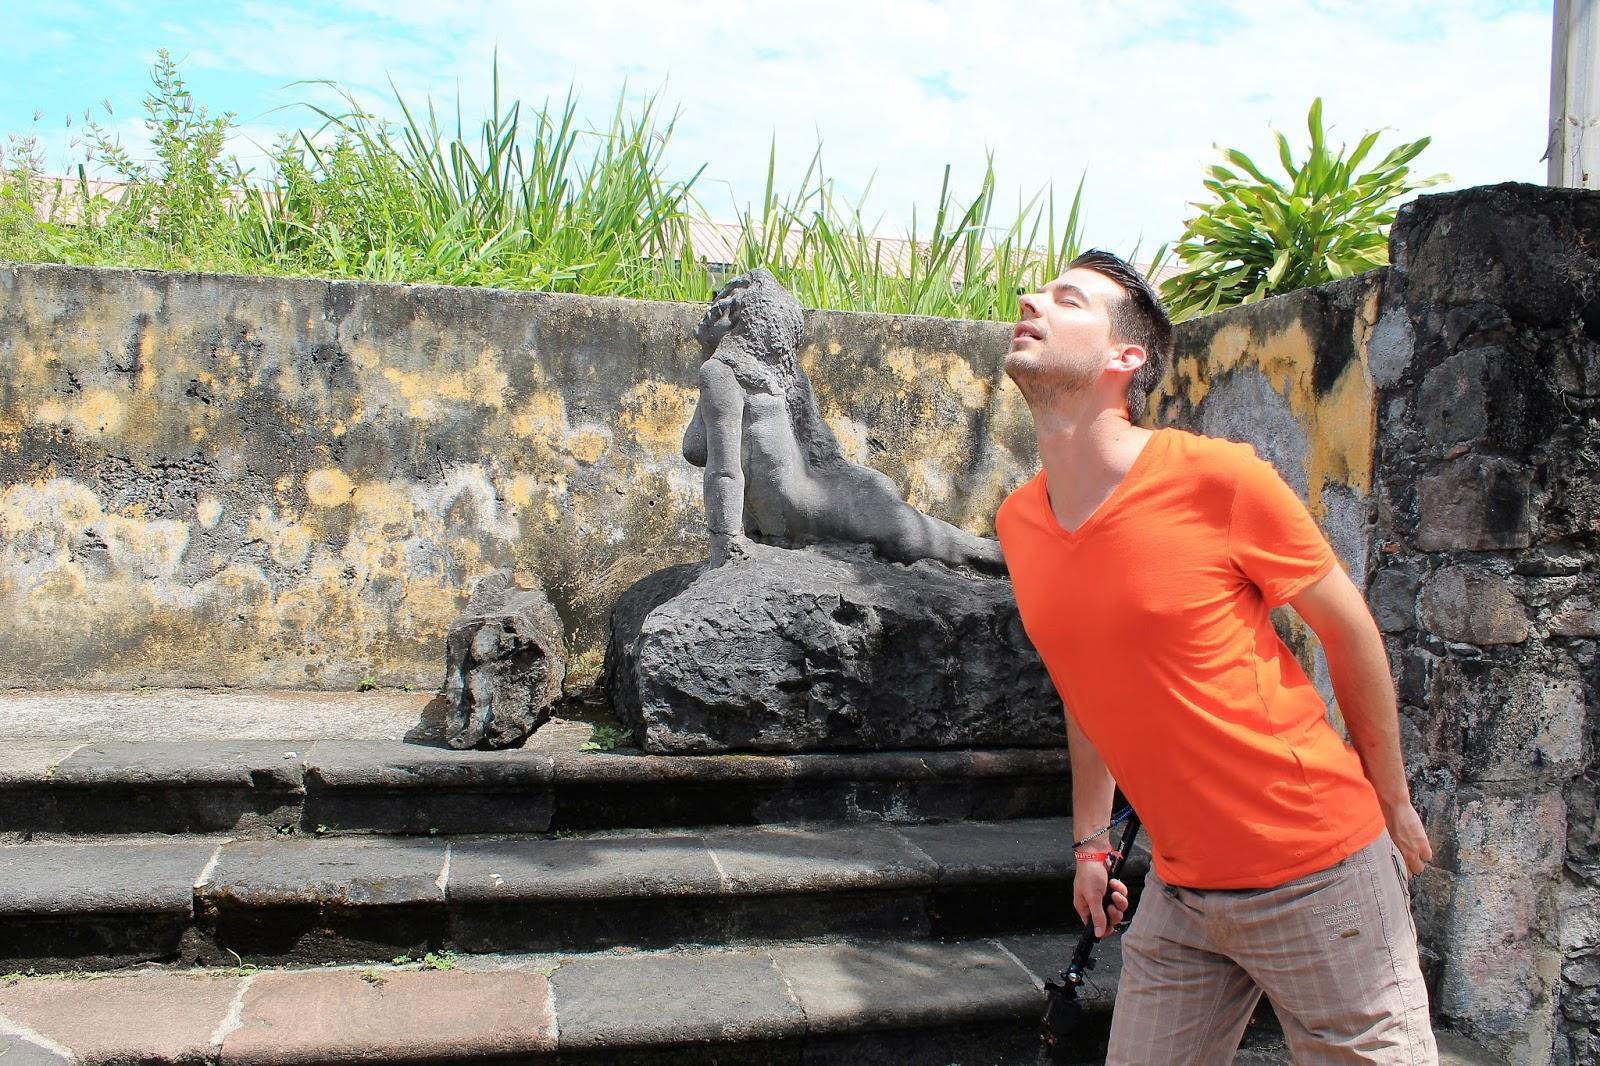 martinique caraibes vacances île dom tom visite saint-pierre statue ruine